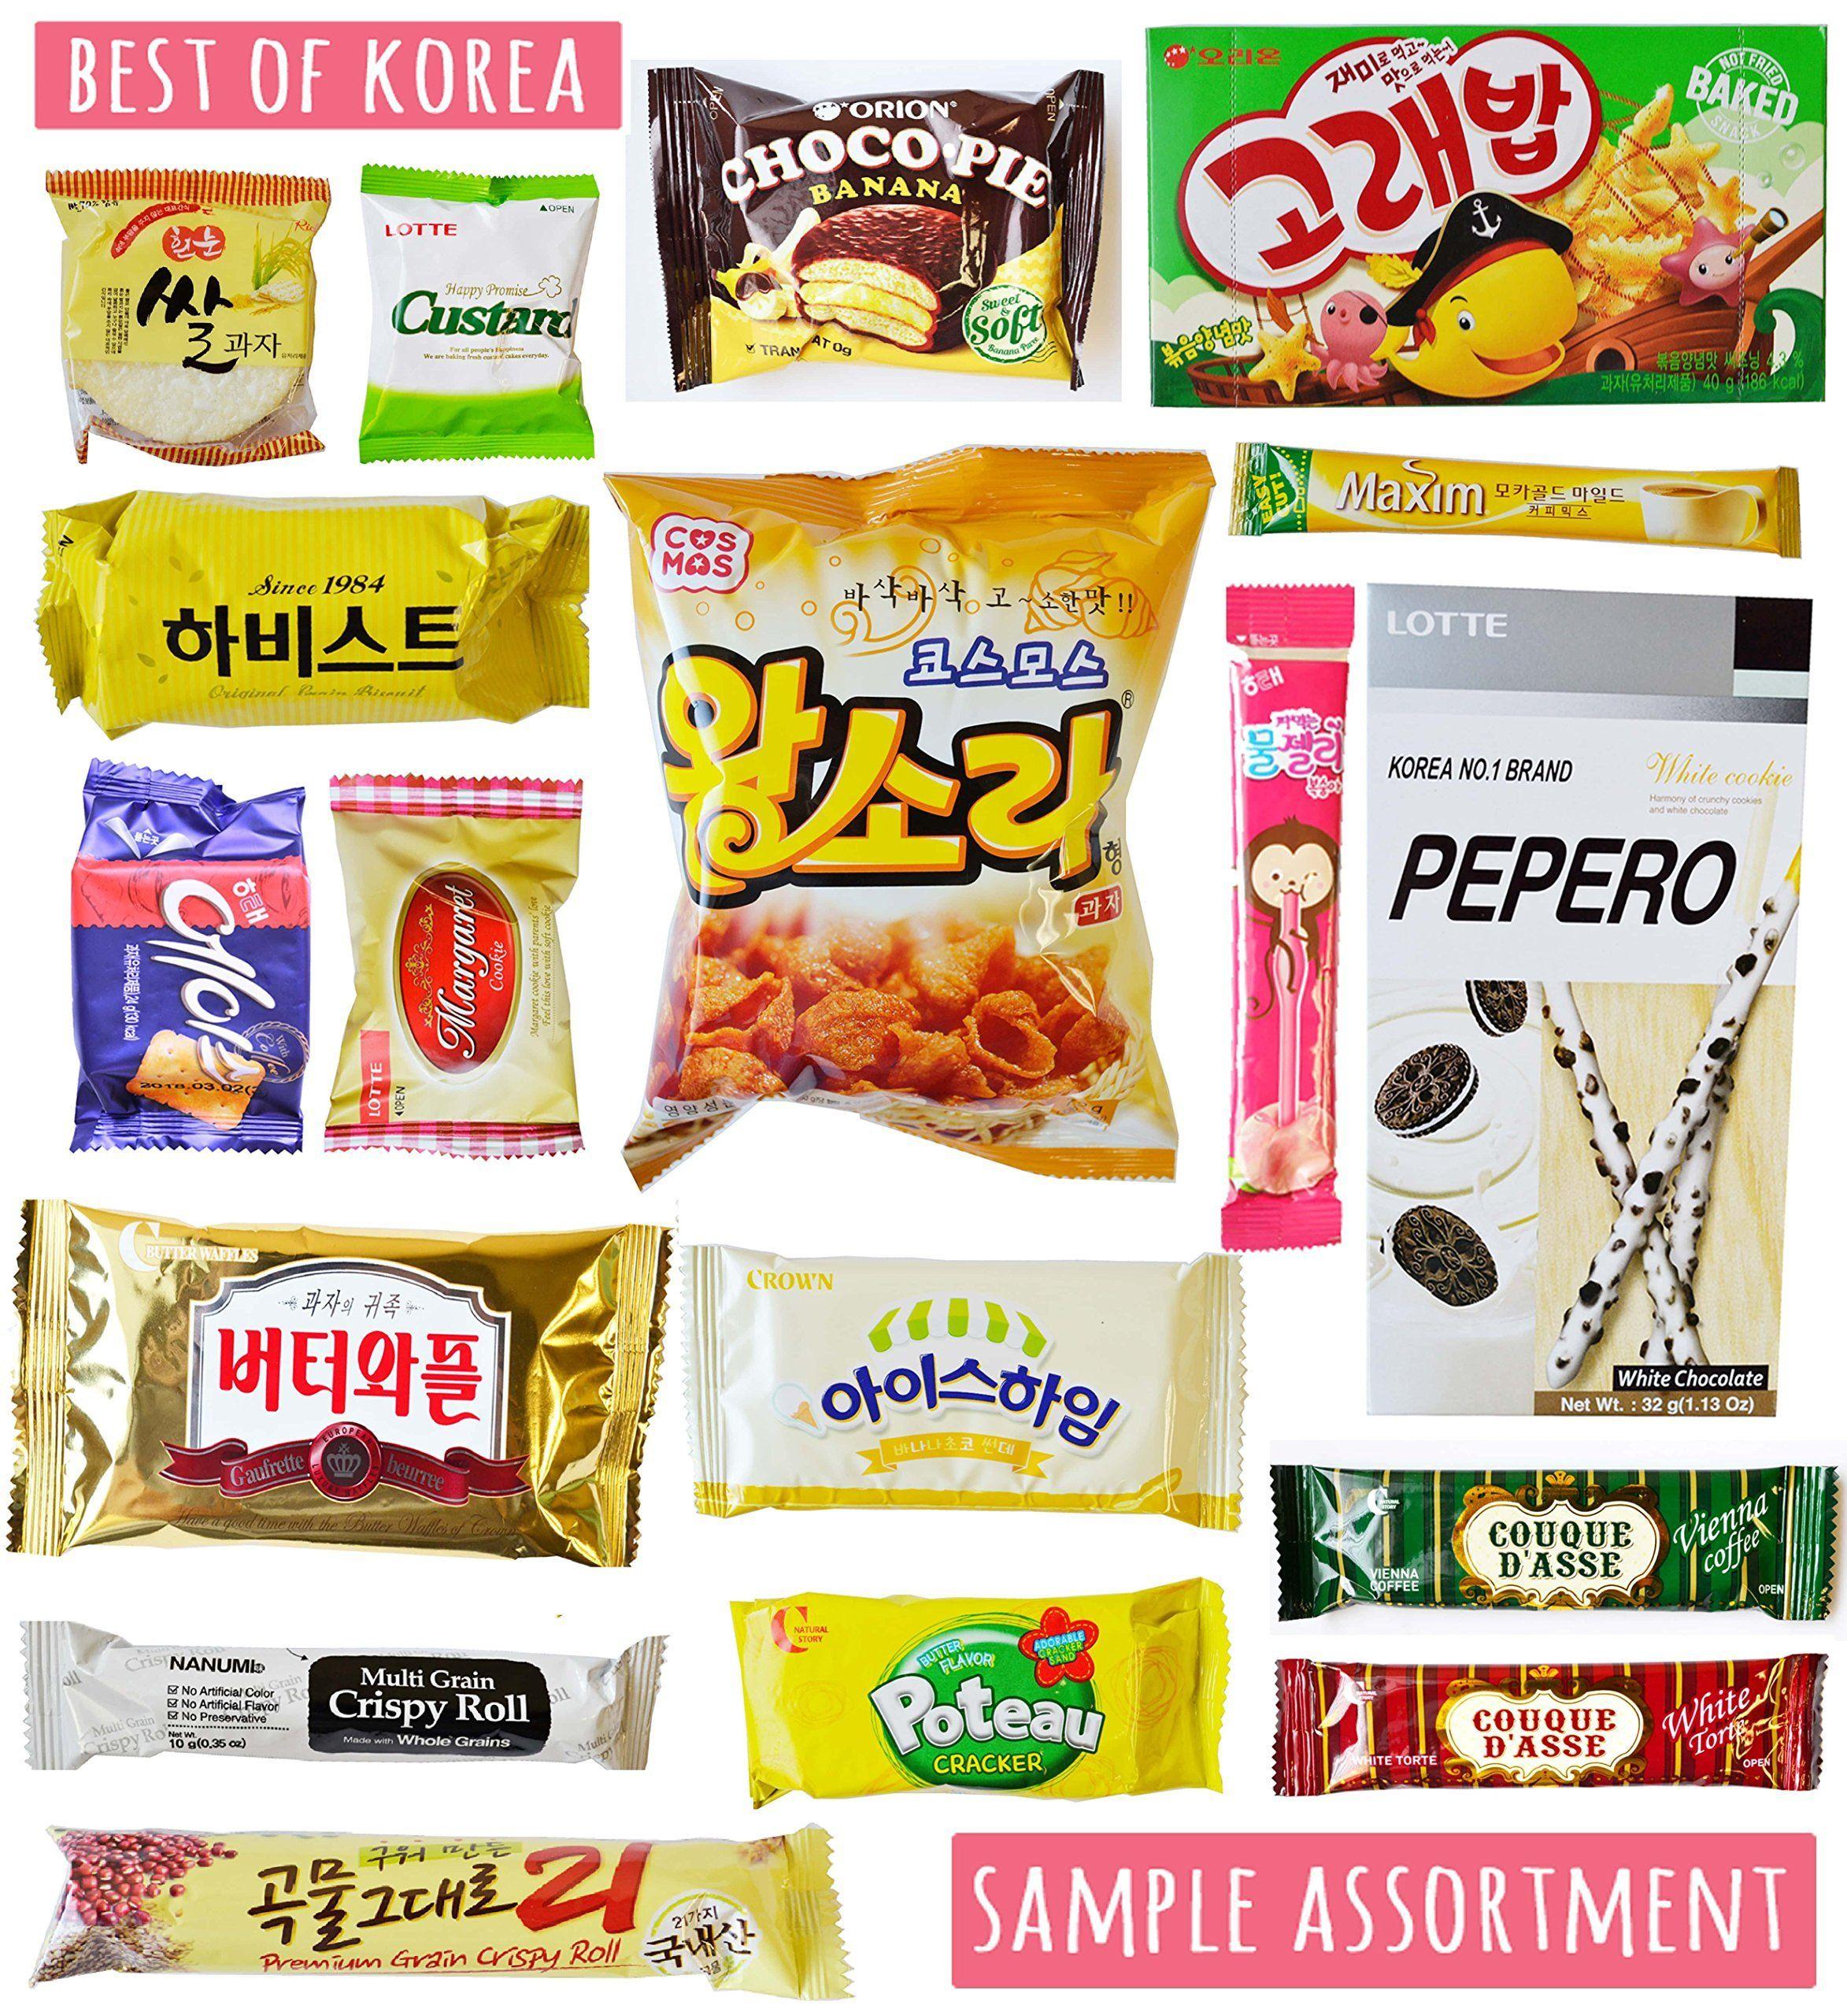 Korean Classic Candy Cookies and Korean Snacks 18 Packs